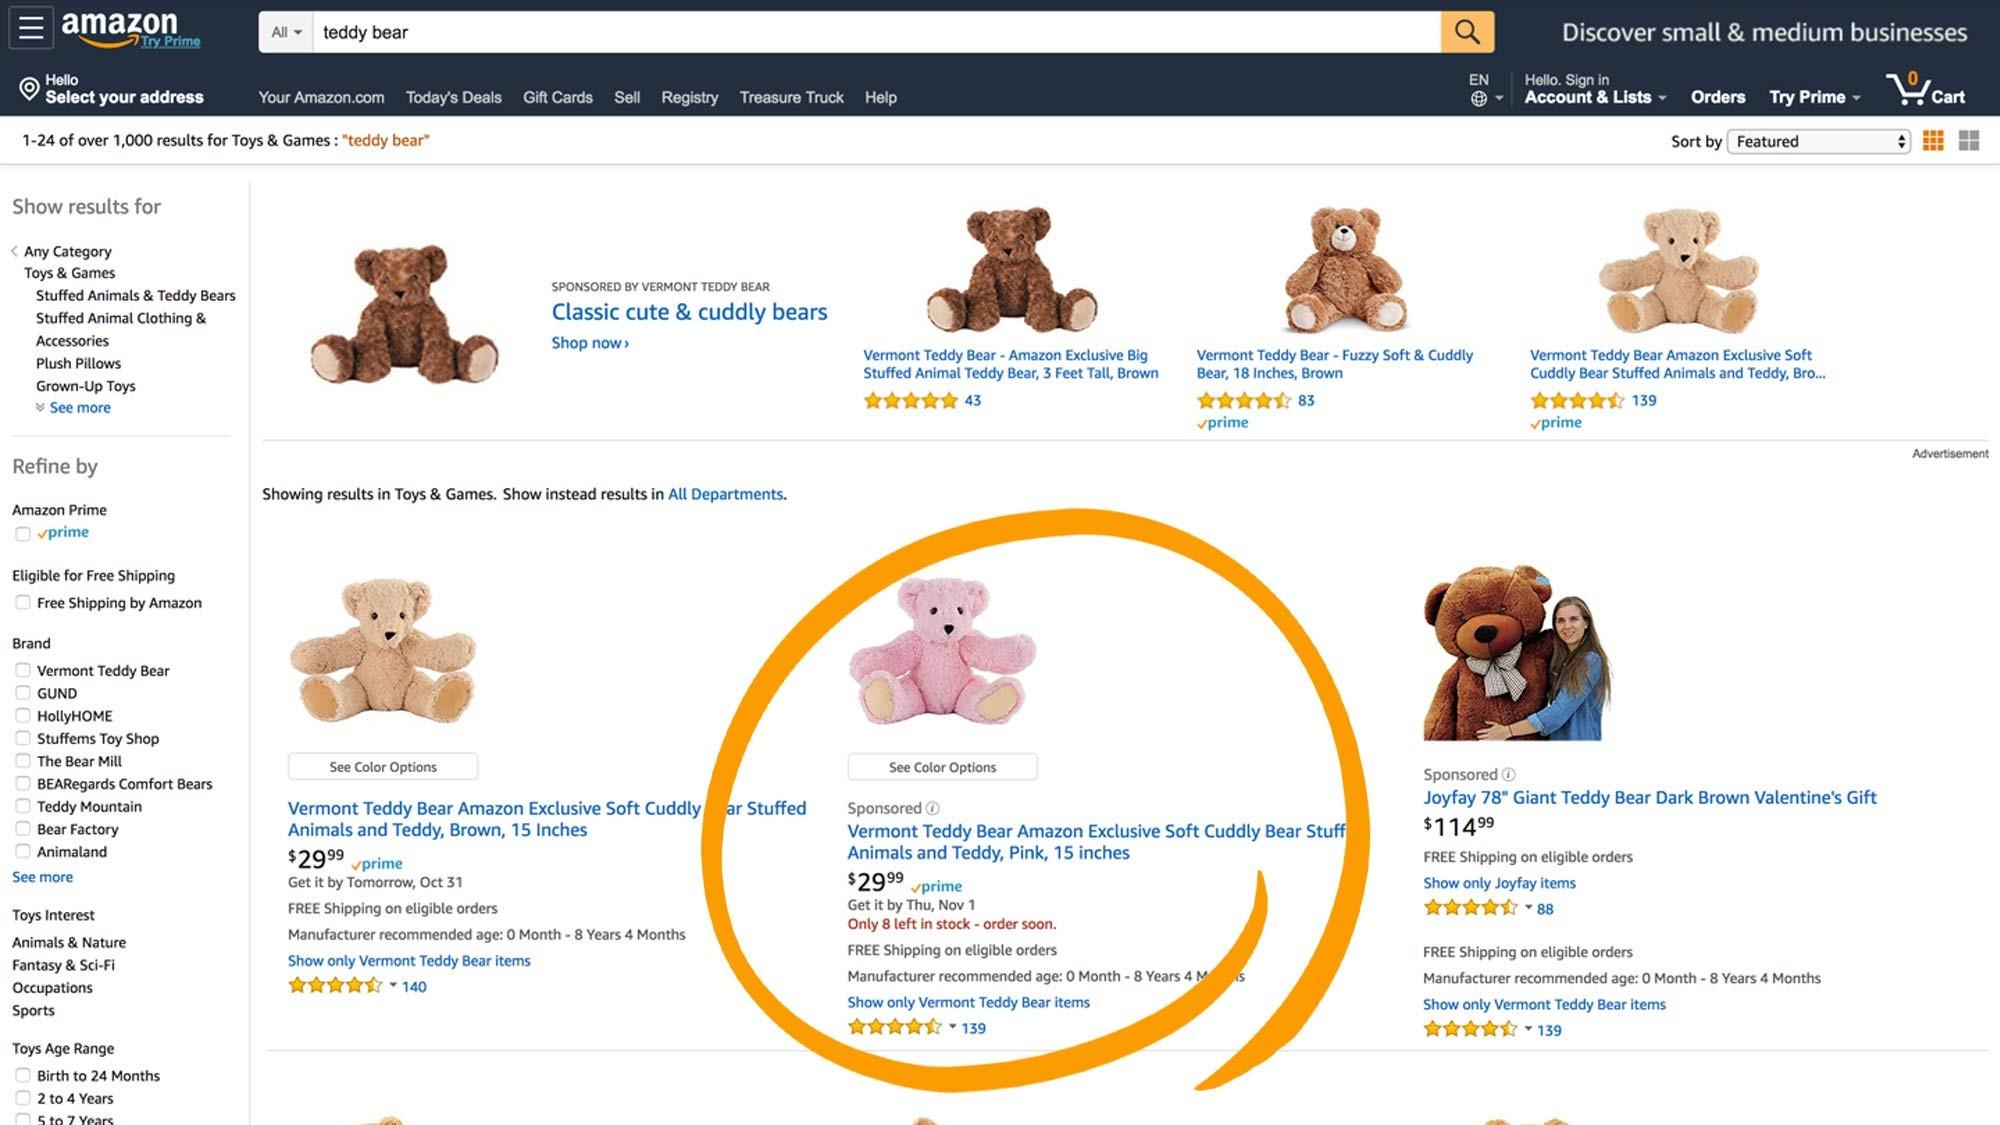 Amazon: sponsored ads